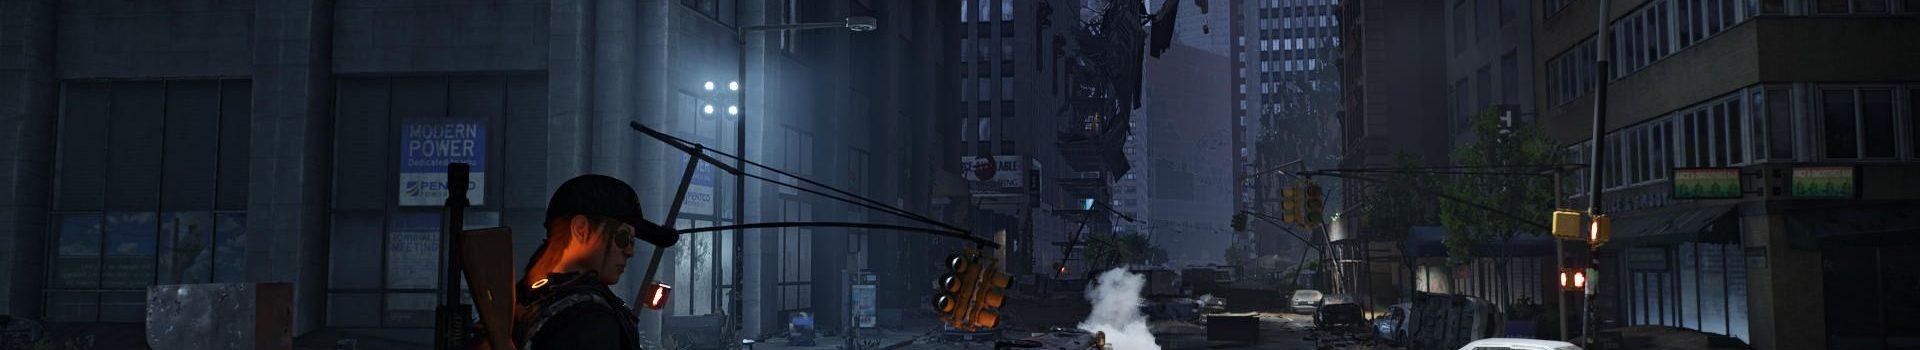 [Division 2] Warlords of New York – Zurück im Big Apple!